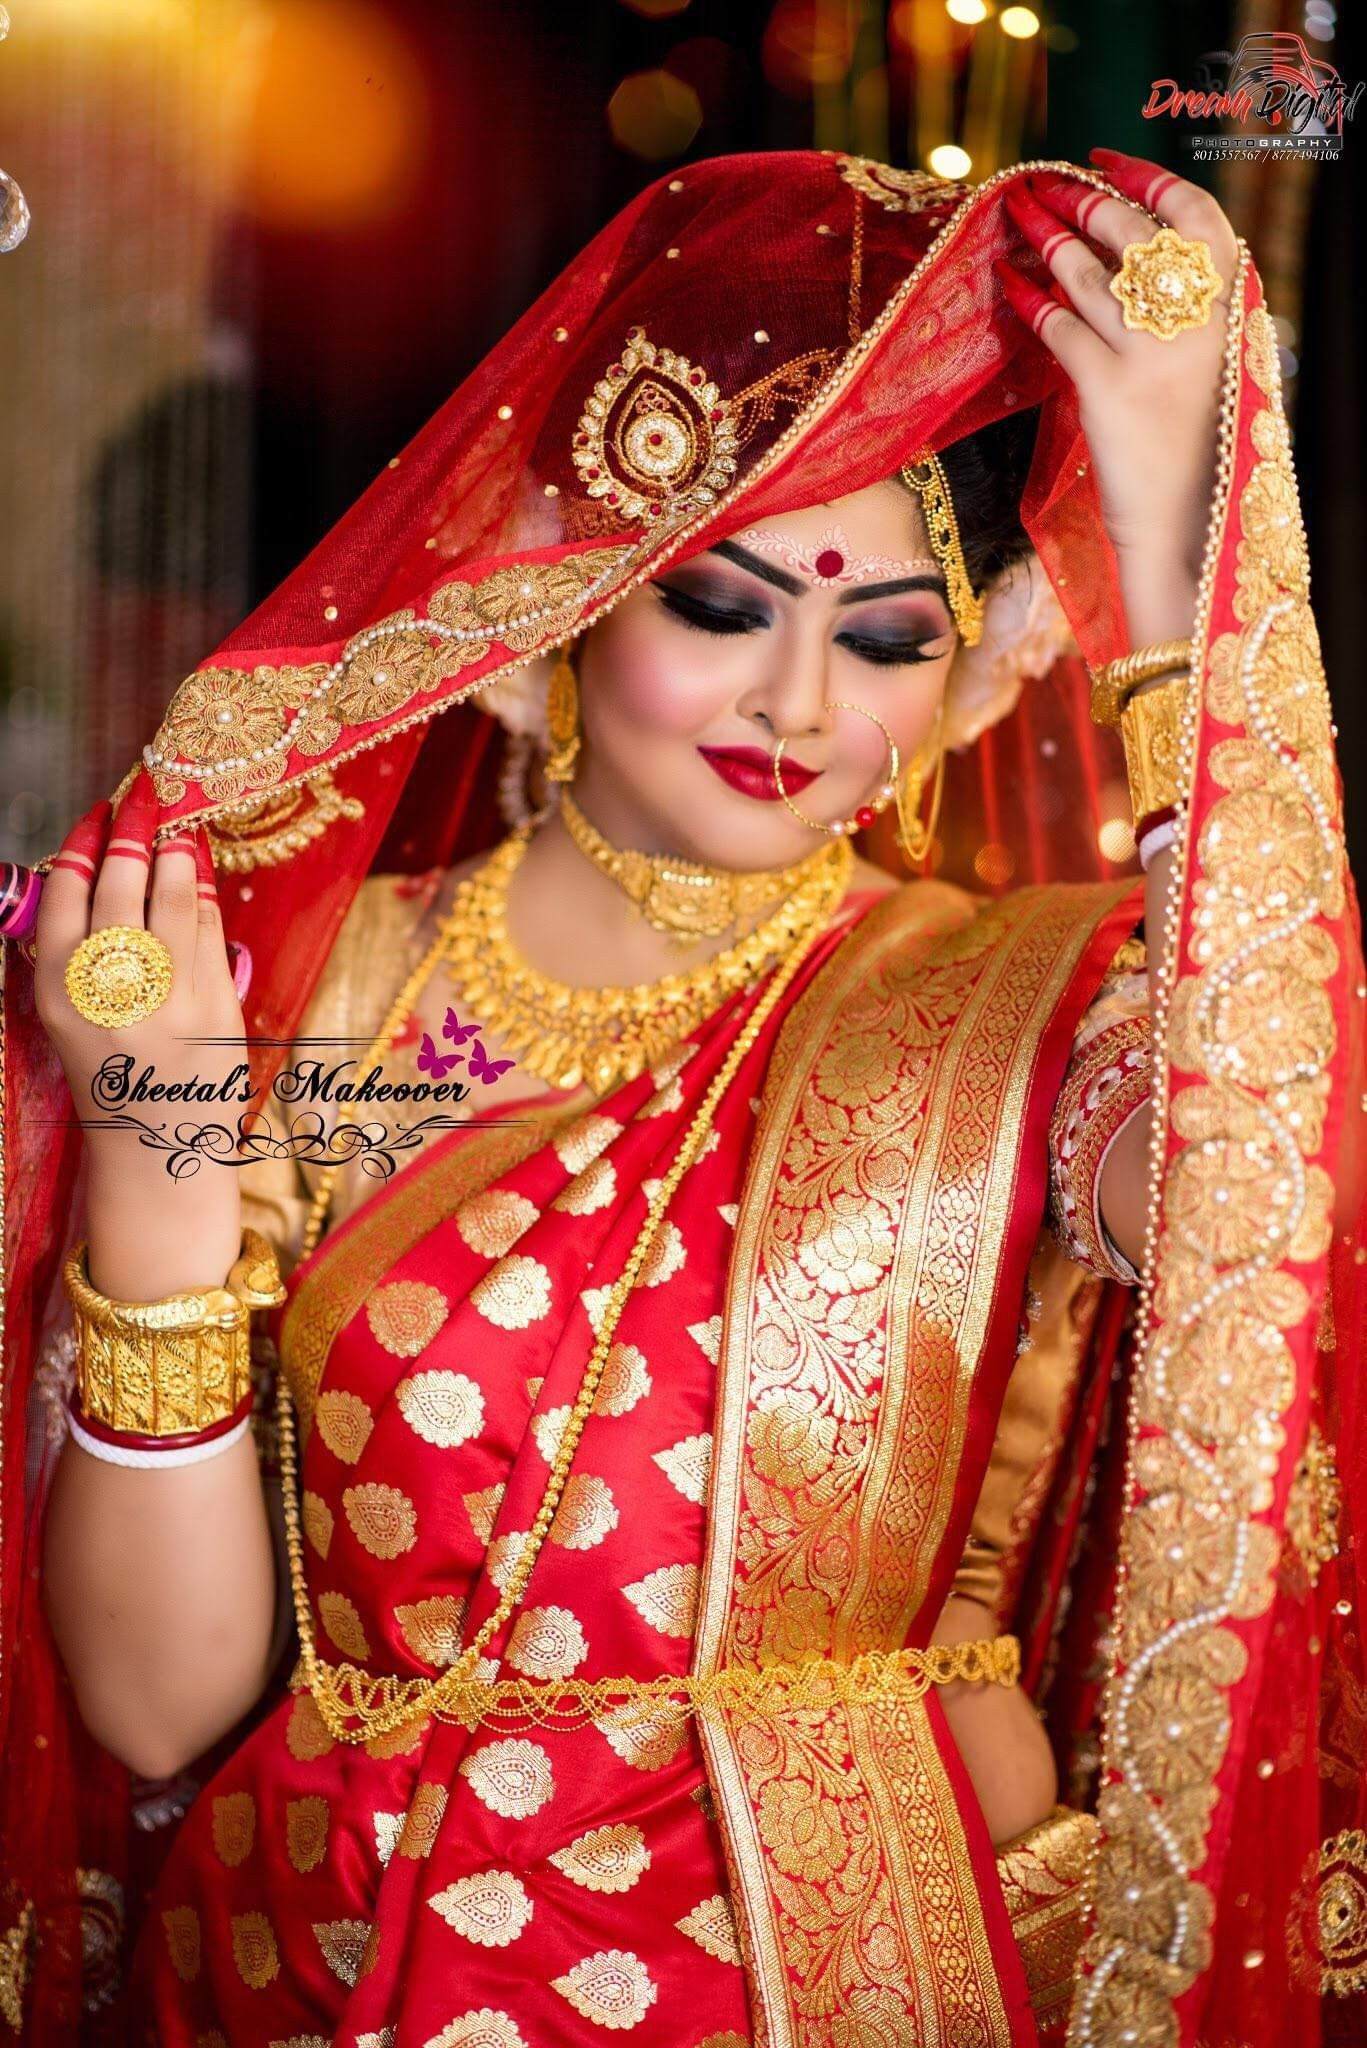 Beautiful bengali bride in 2020 indian wedding bride